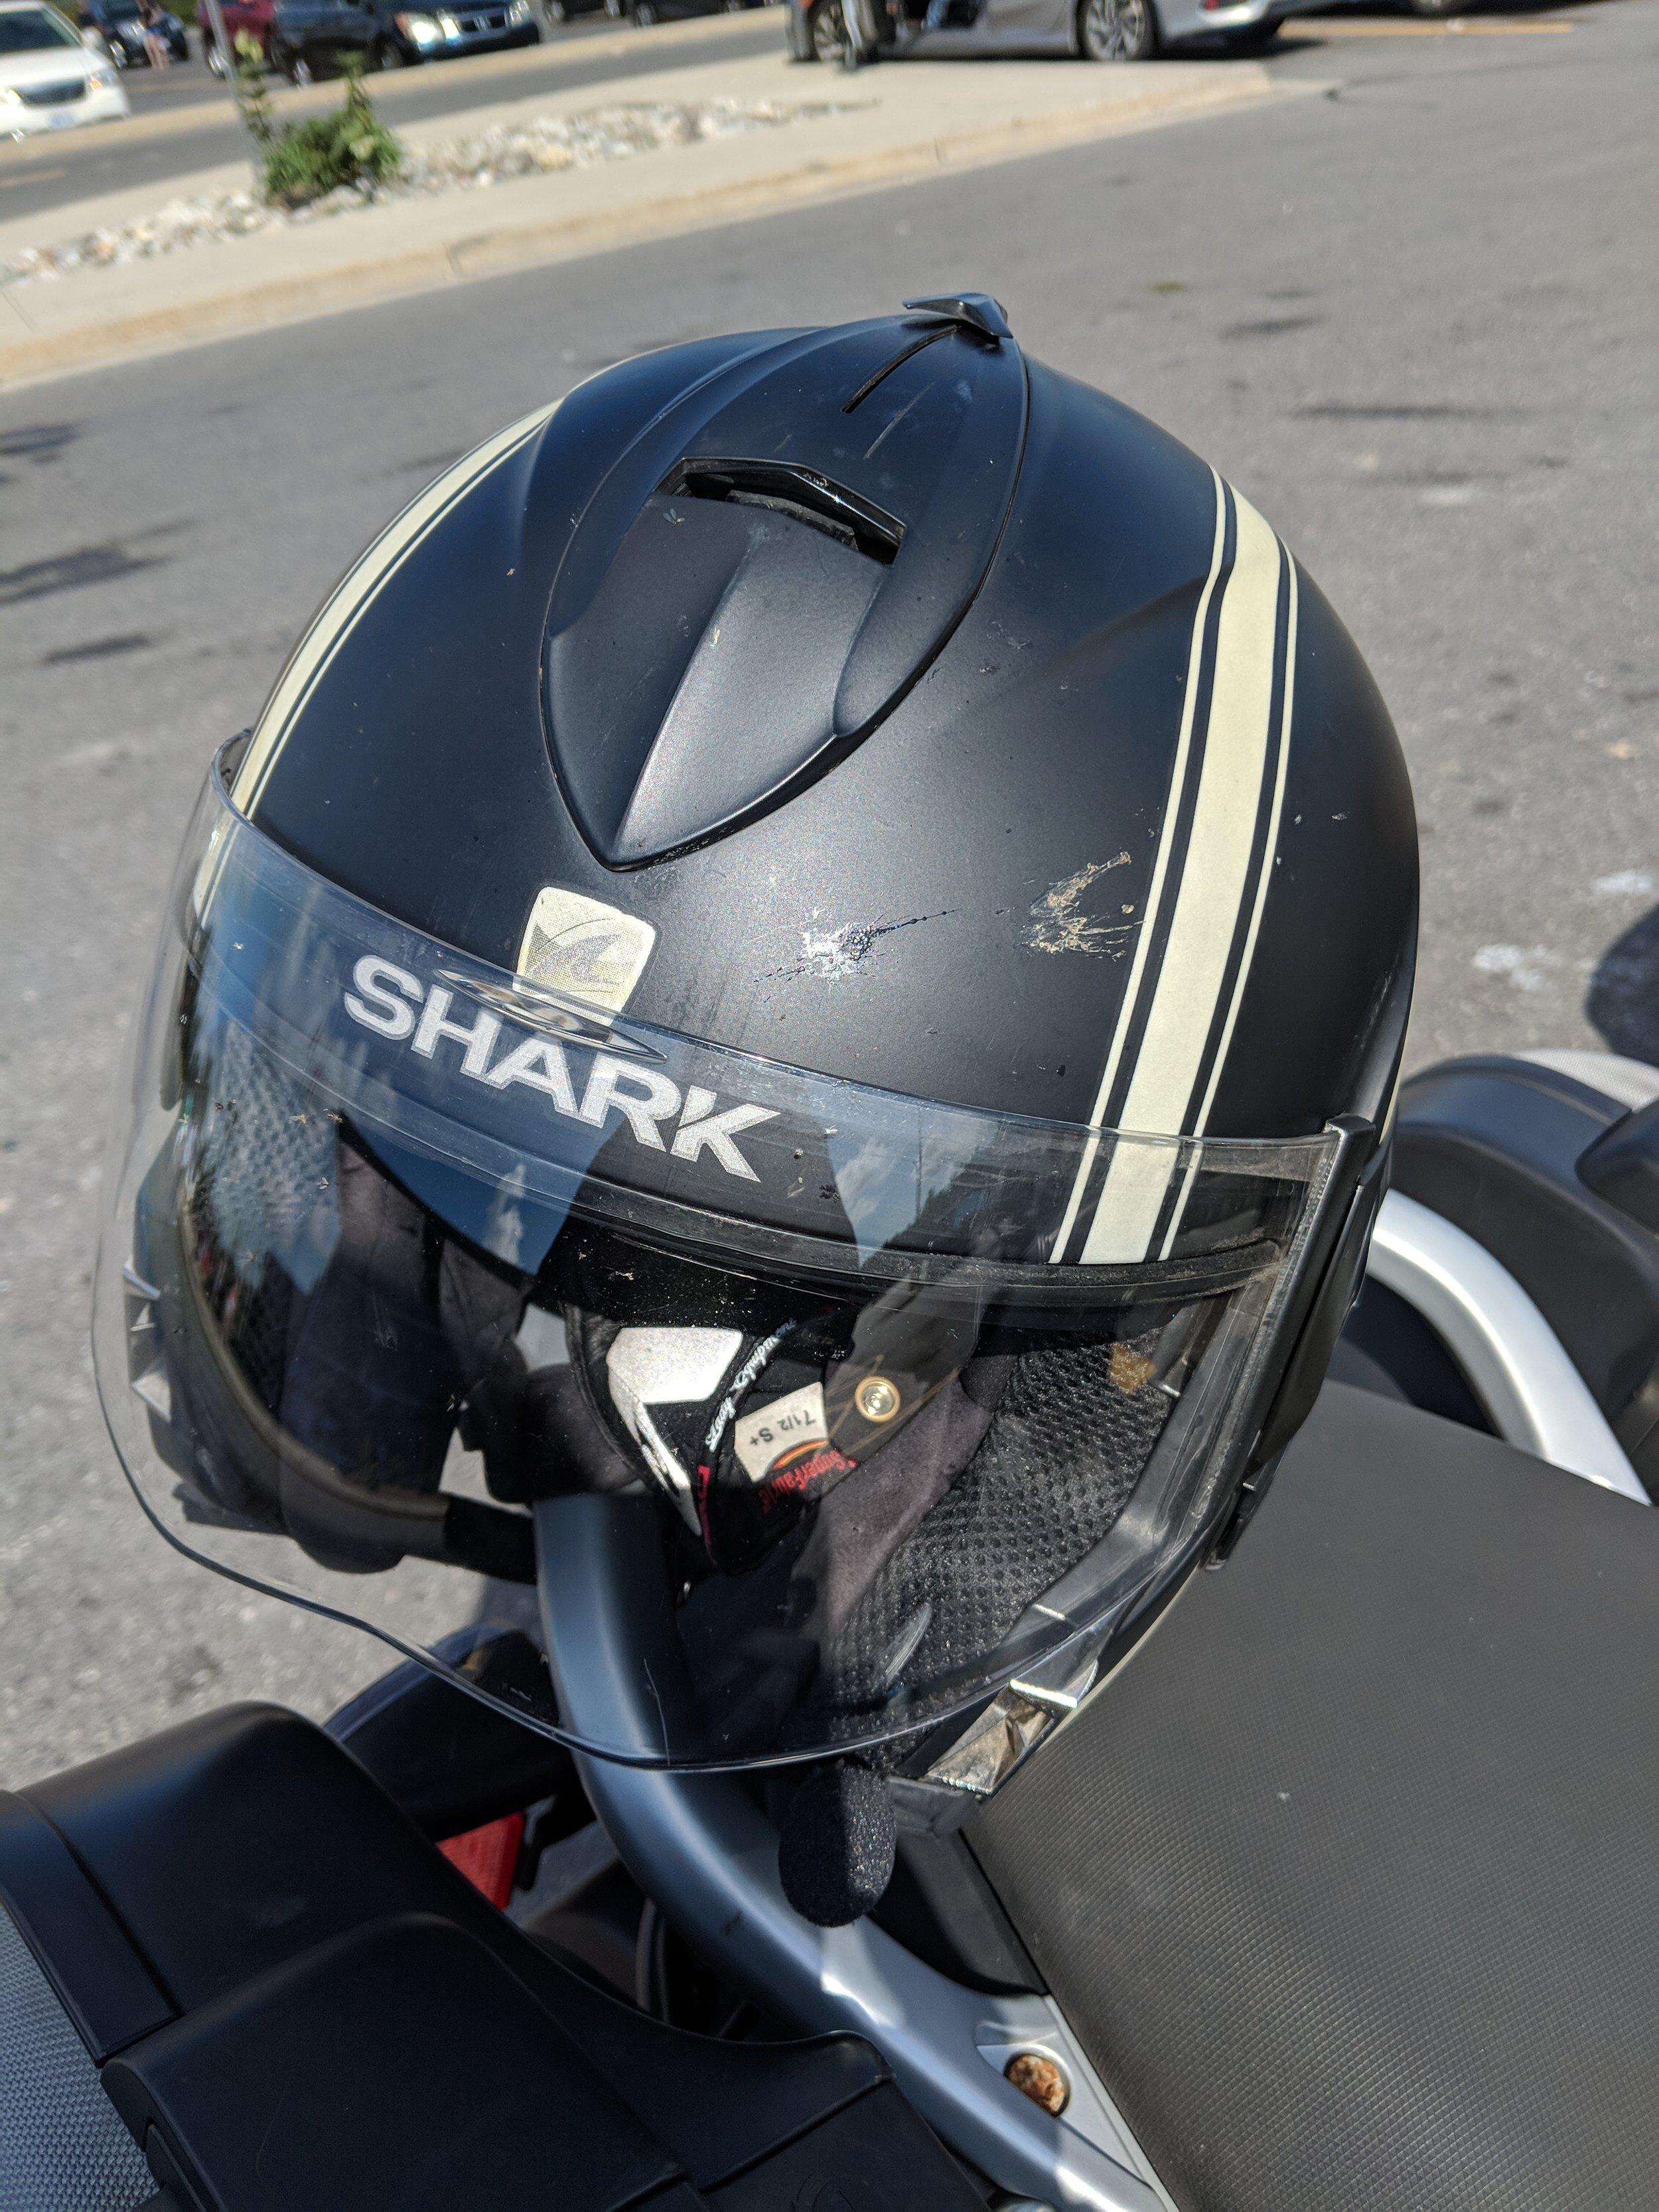 Bug splats on the helmet.